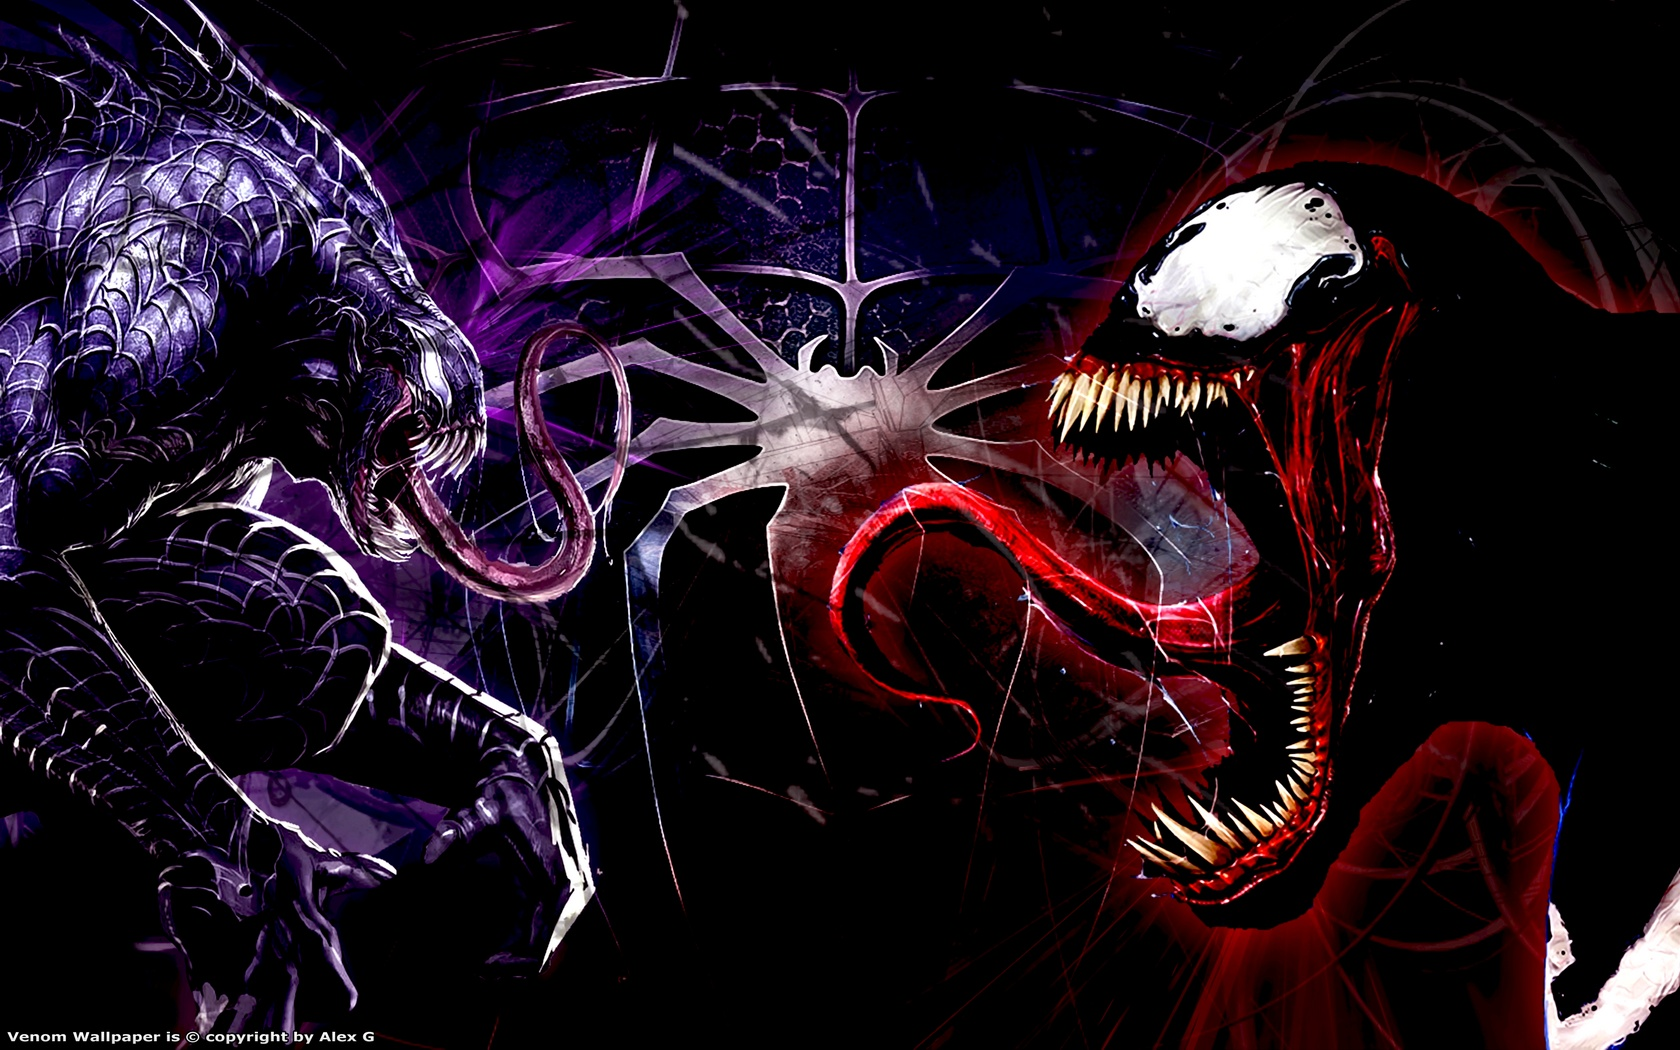 Wallpaper HD Spiderman Venom Carnage   Taringa 1680x1050